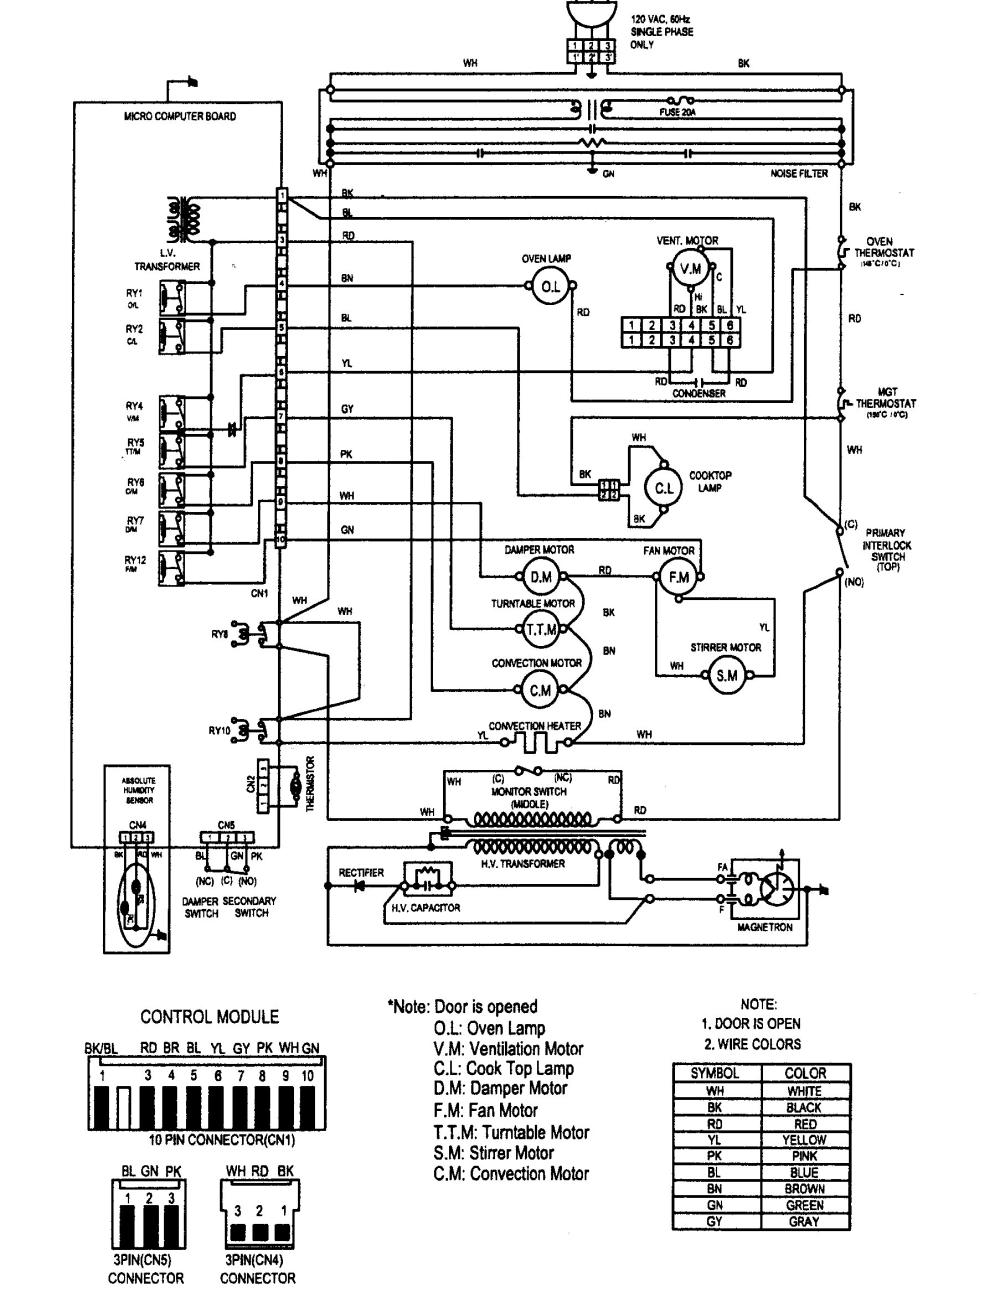 medium resolution of kenmore 116 51612002 wiring diagram complete wiring diagrams u2022 kenmore washer wiring diagram kenmore elite